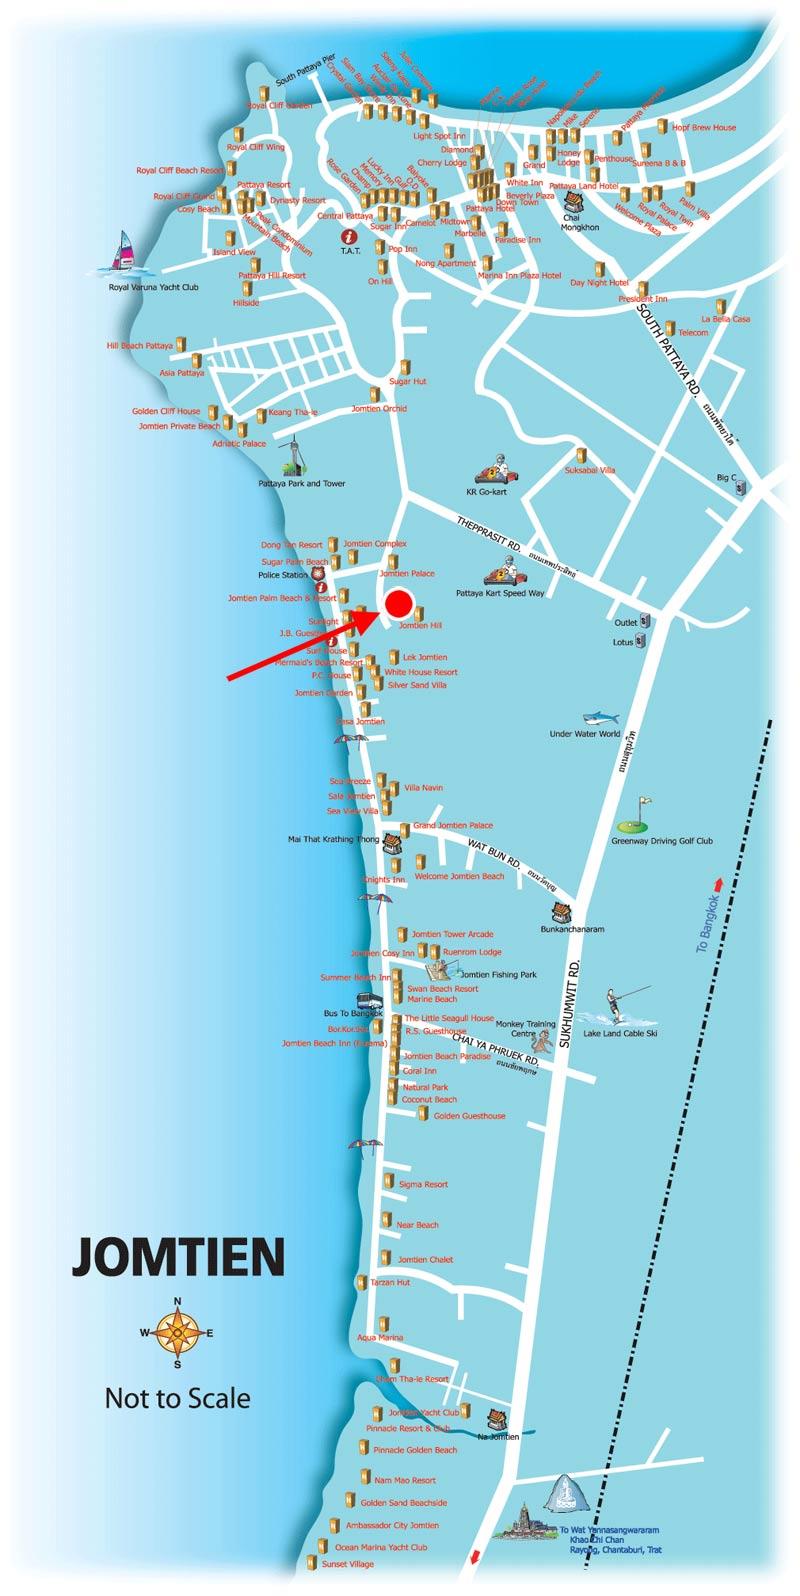 Pattaya Maps - TeakDoor.com - The Thailand Forum